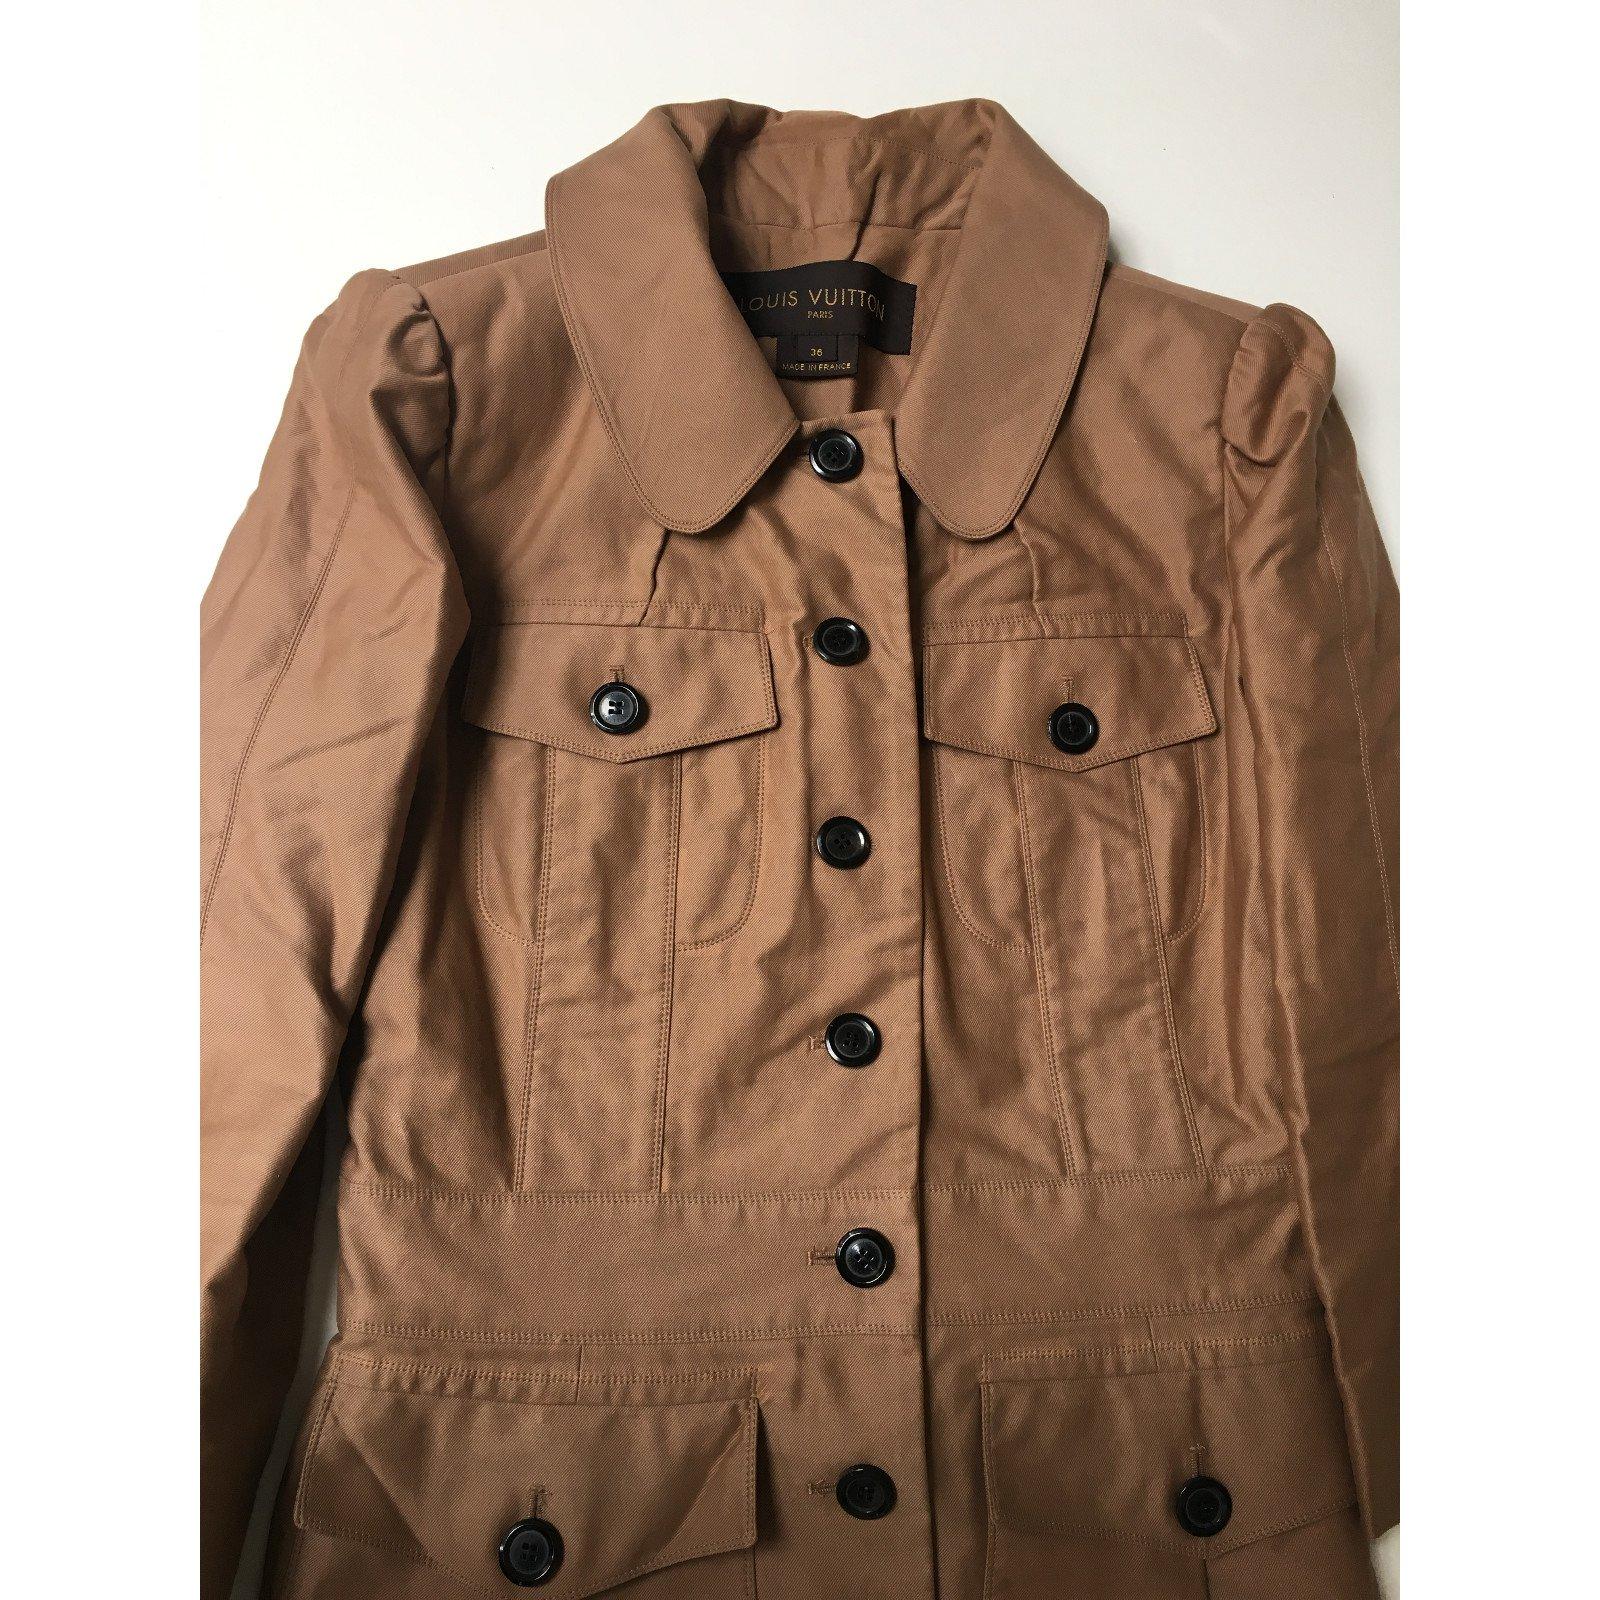 louis vuitton jacket jackets cotton caramel. Black Bedroom Furniture Sets. Home Design Ideas